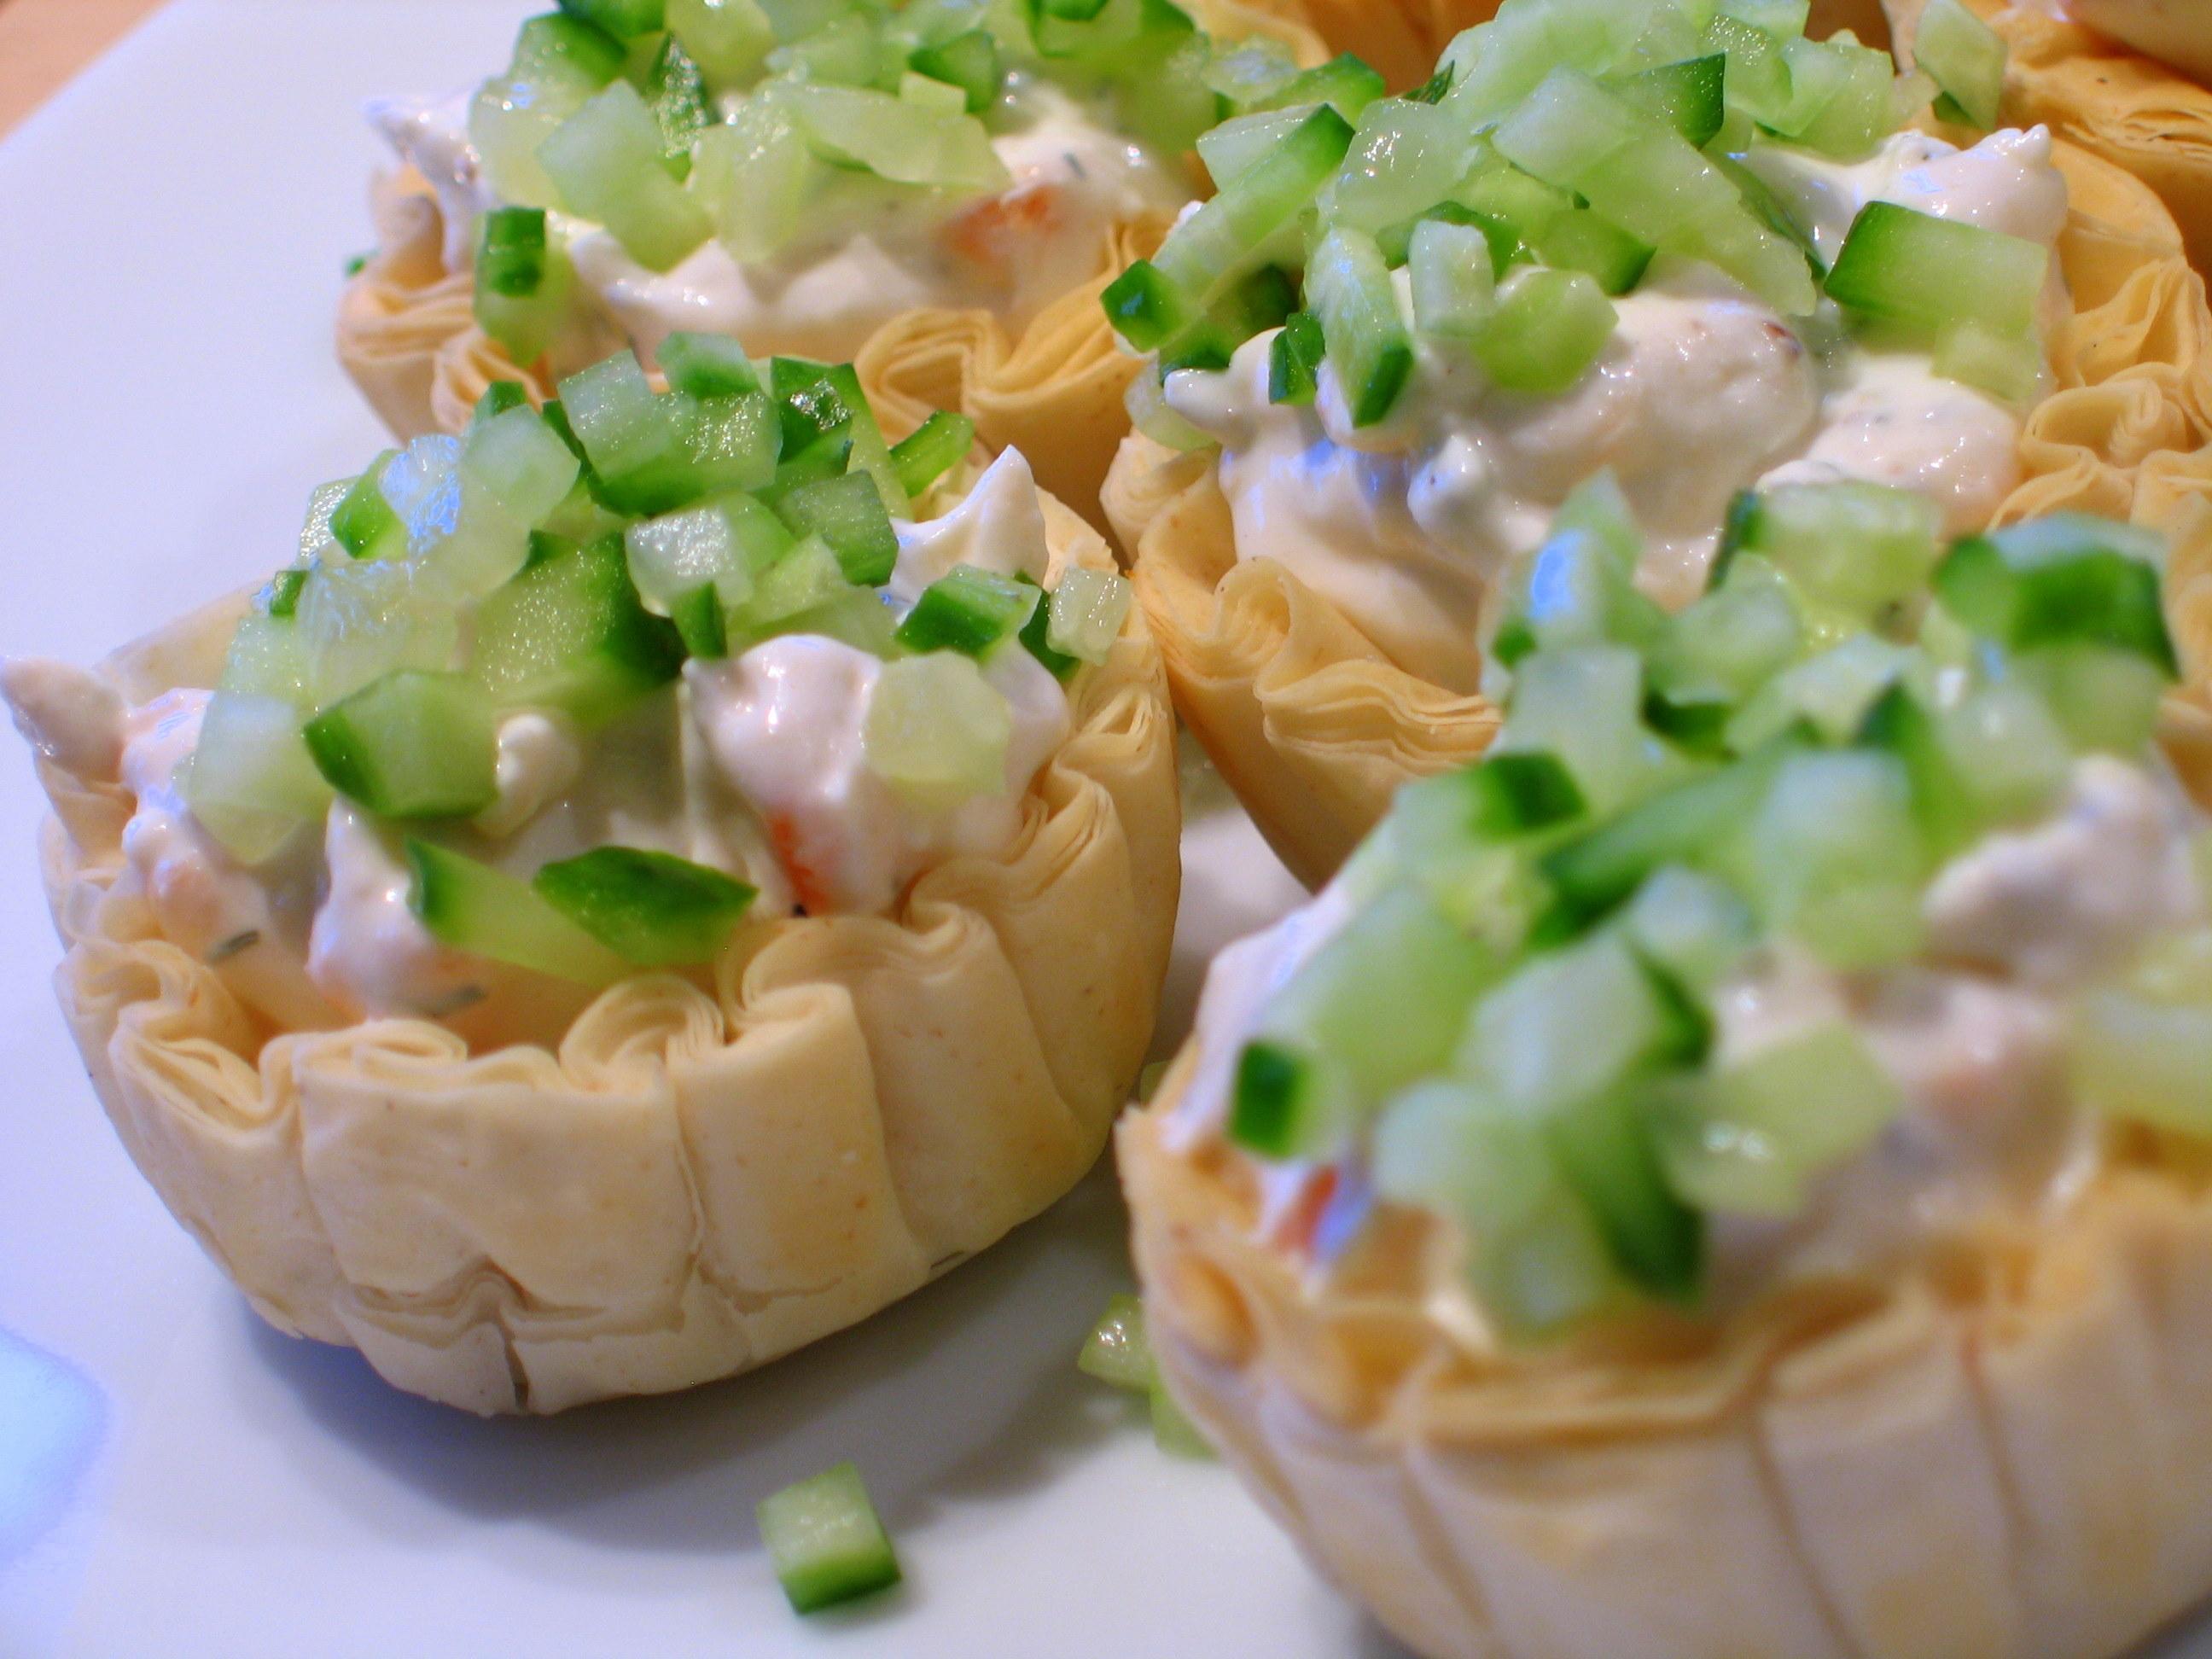 Smoked_salmon,_chive,_cream_cheese,_sour_cream_and_cucumber